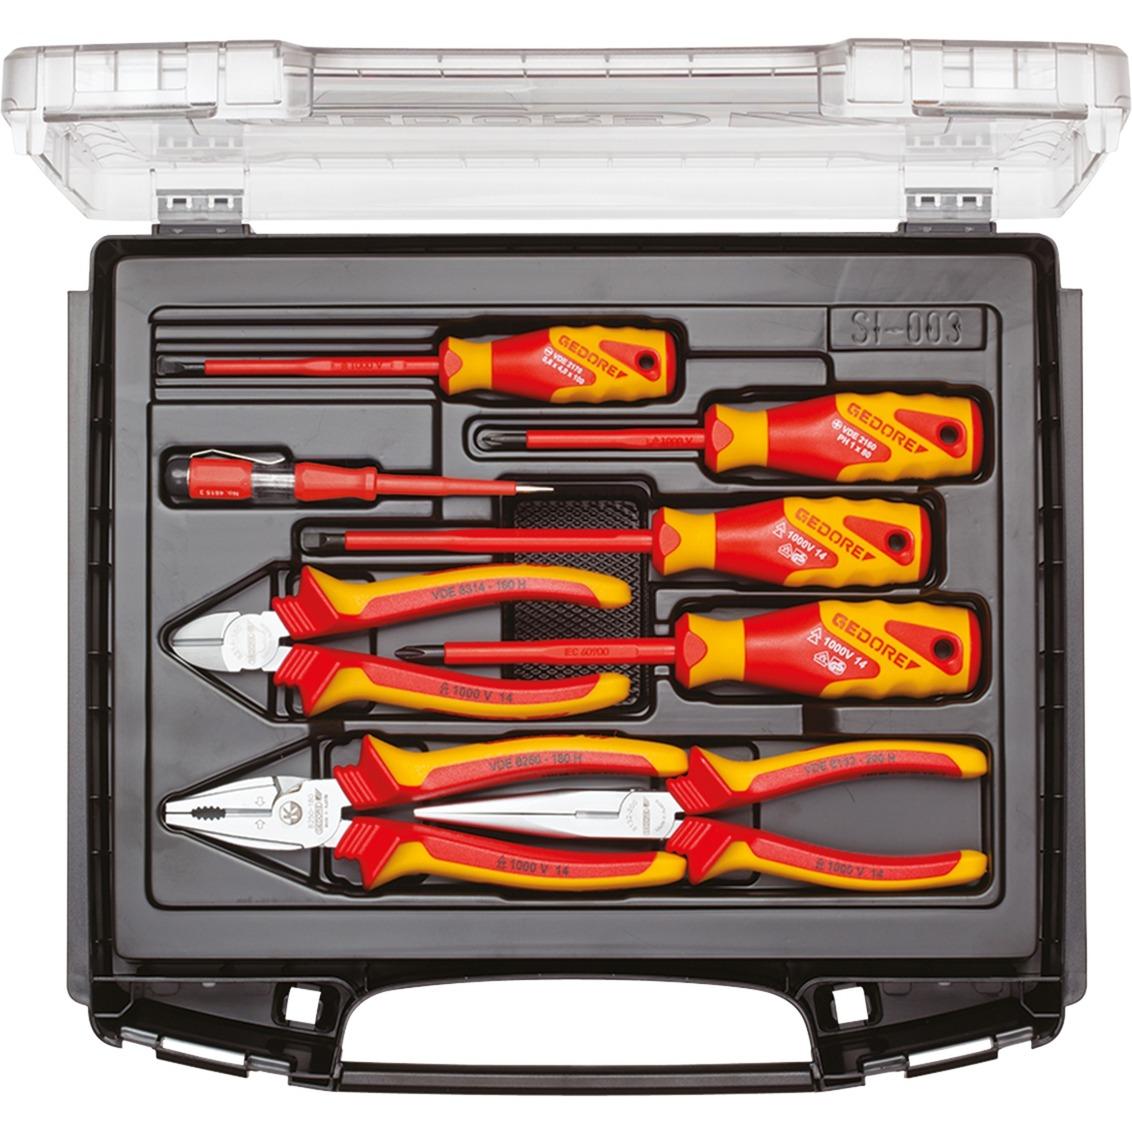 1828045, Kit de herramientas